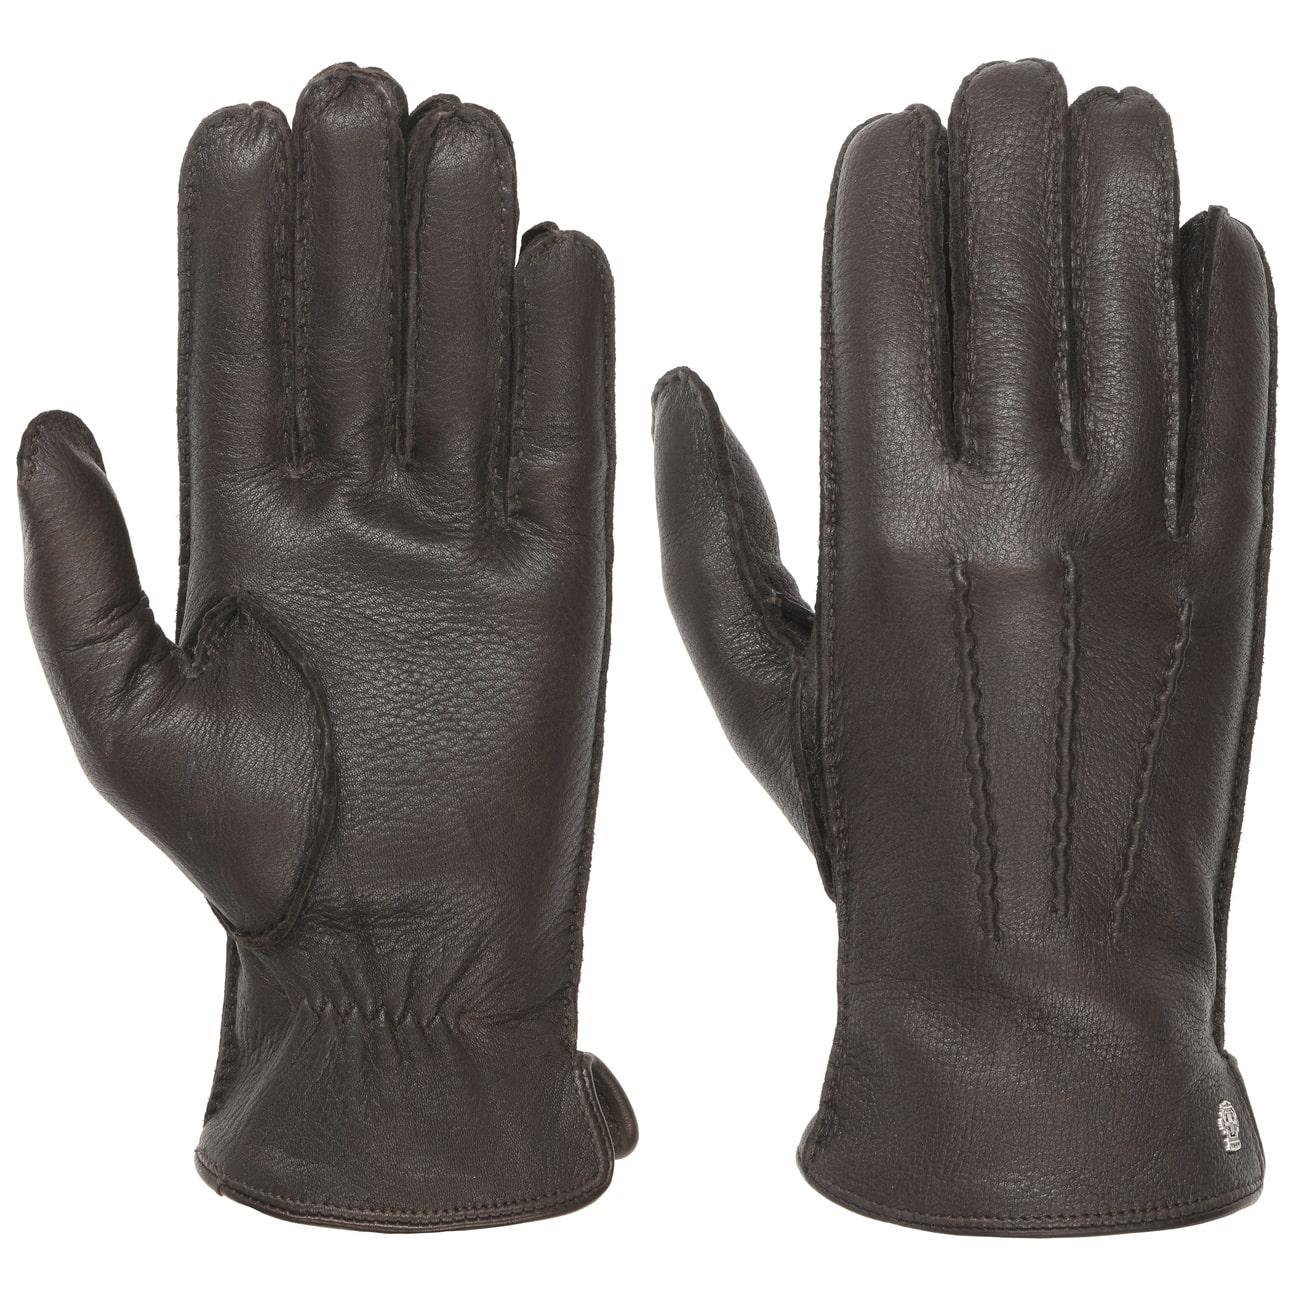 Guantes de Hombre Sting by Roeckl  guantes